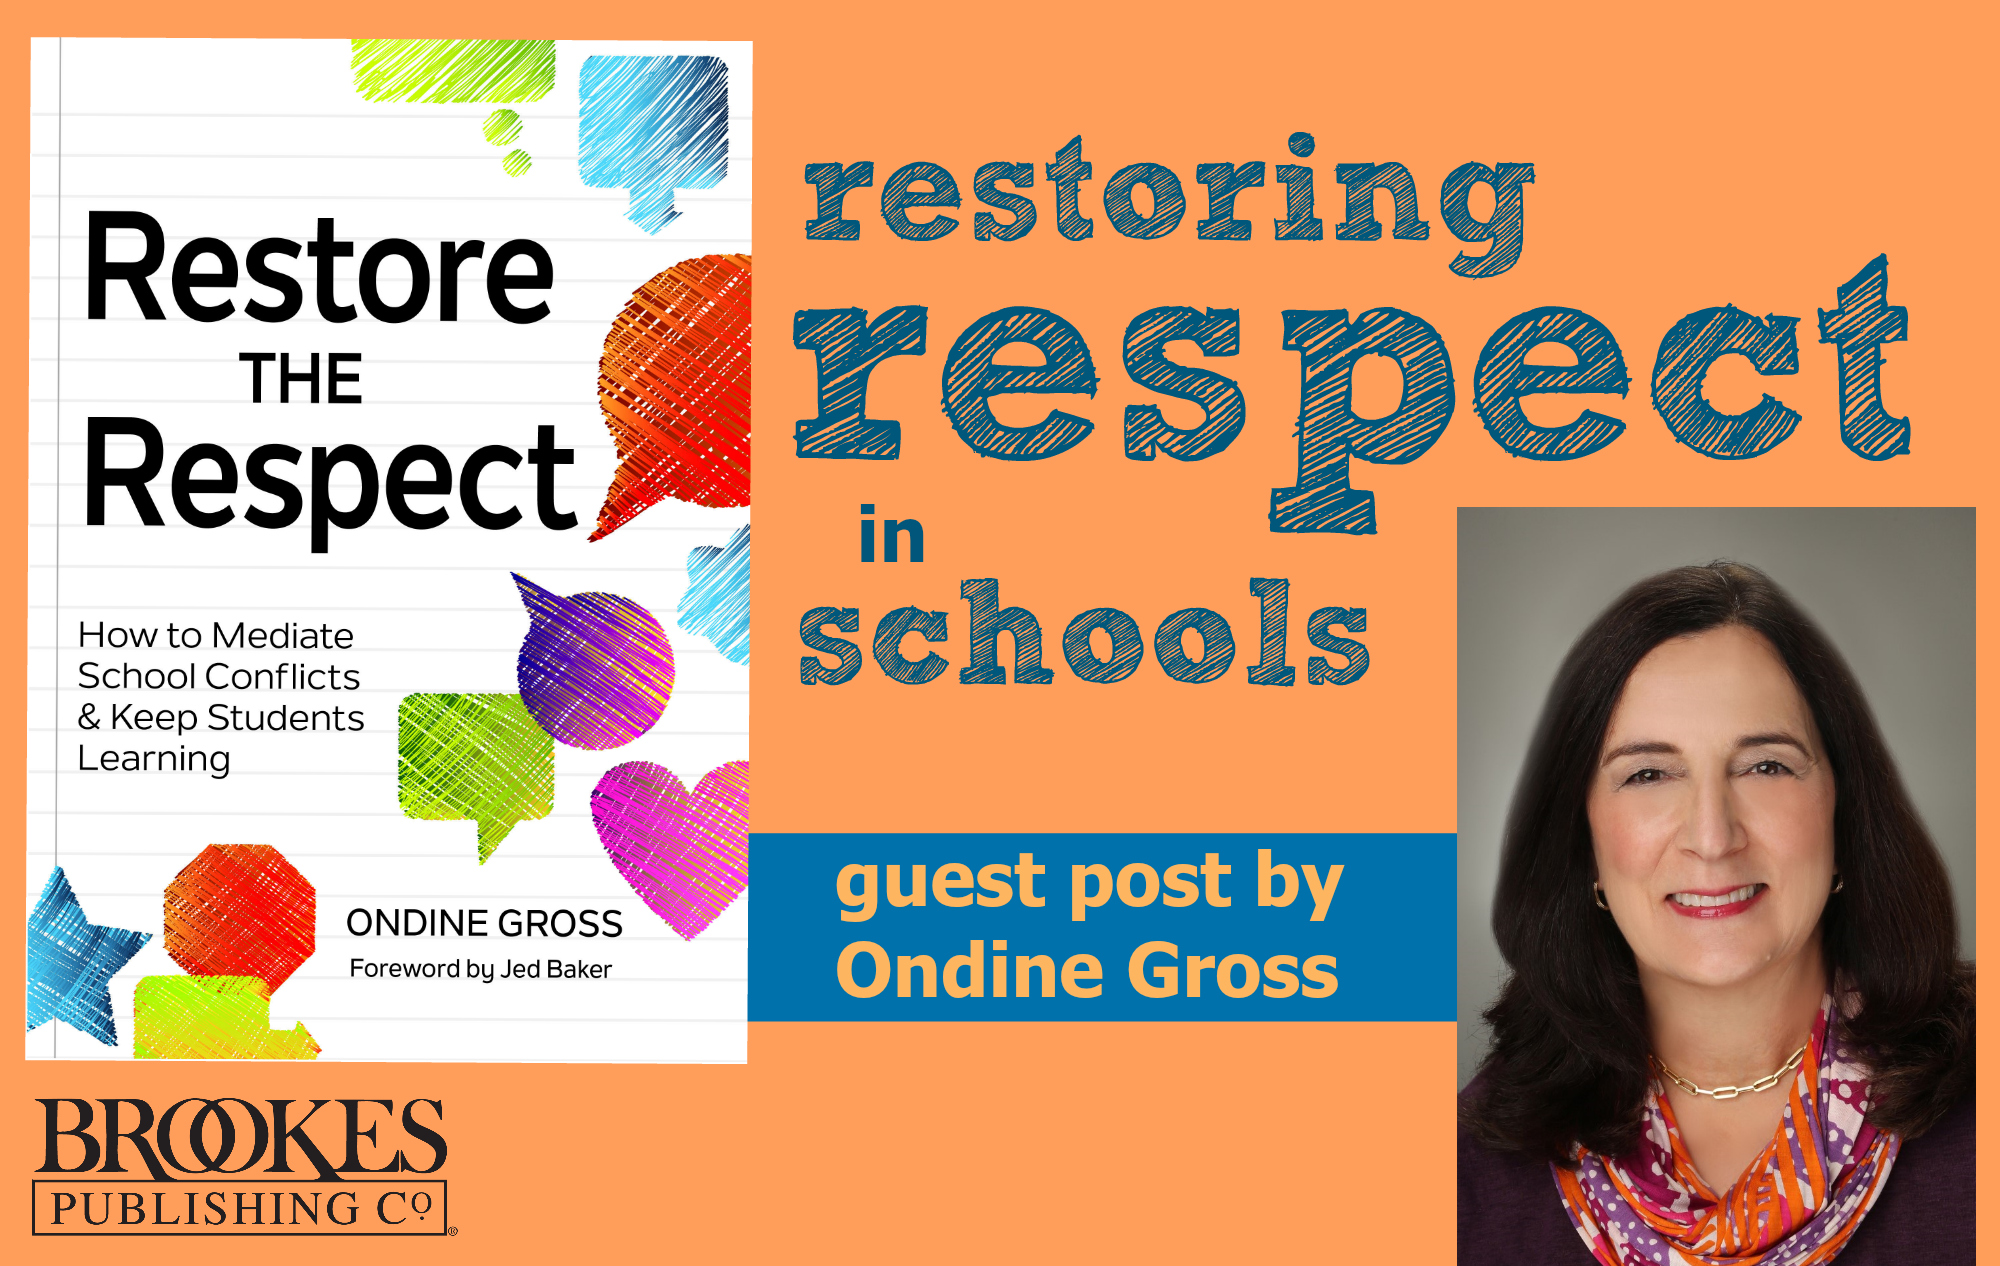 restore the respect ondine gross blog post interview